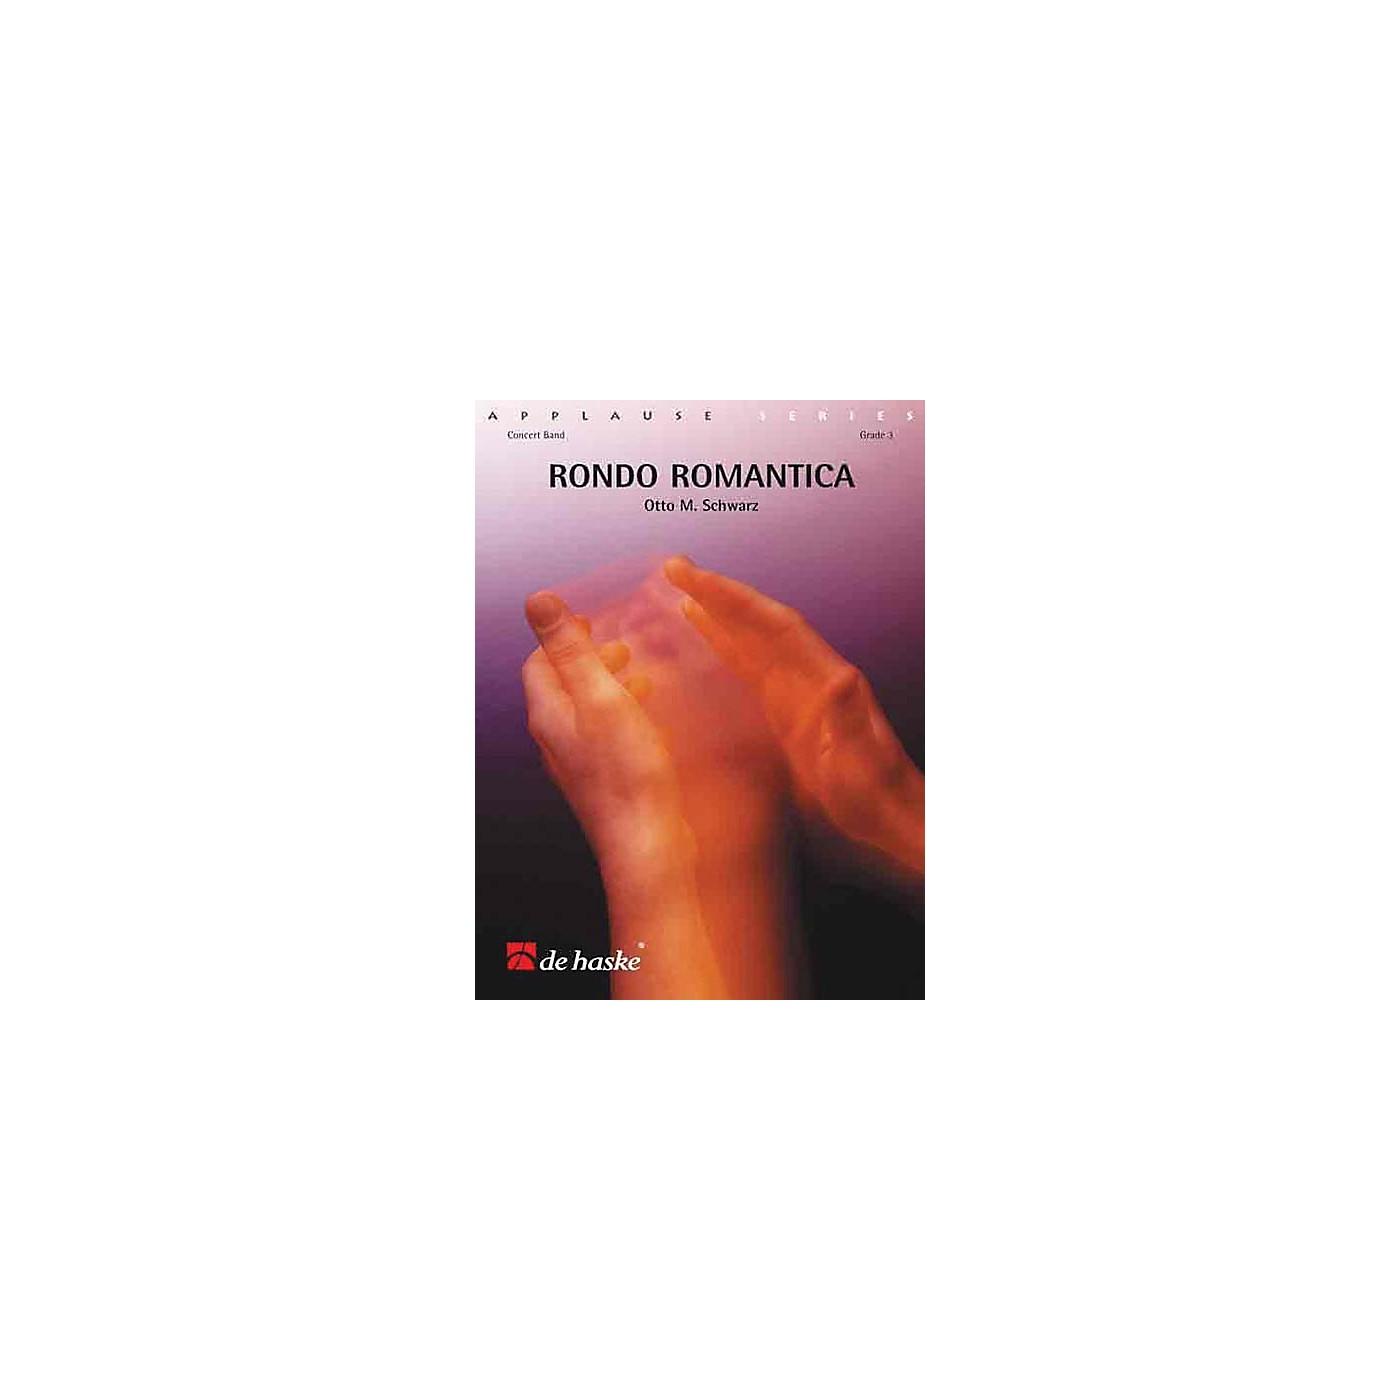 Hal Leonard Rondo Romantica Score Only Concert Band thumbnail